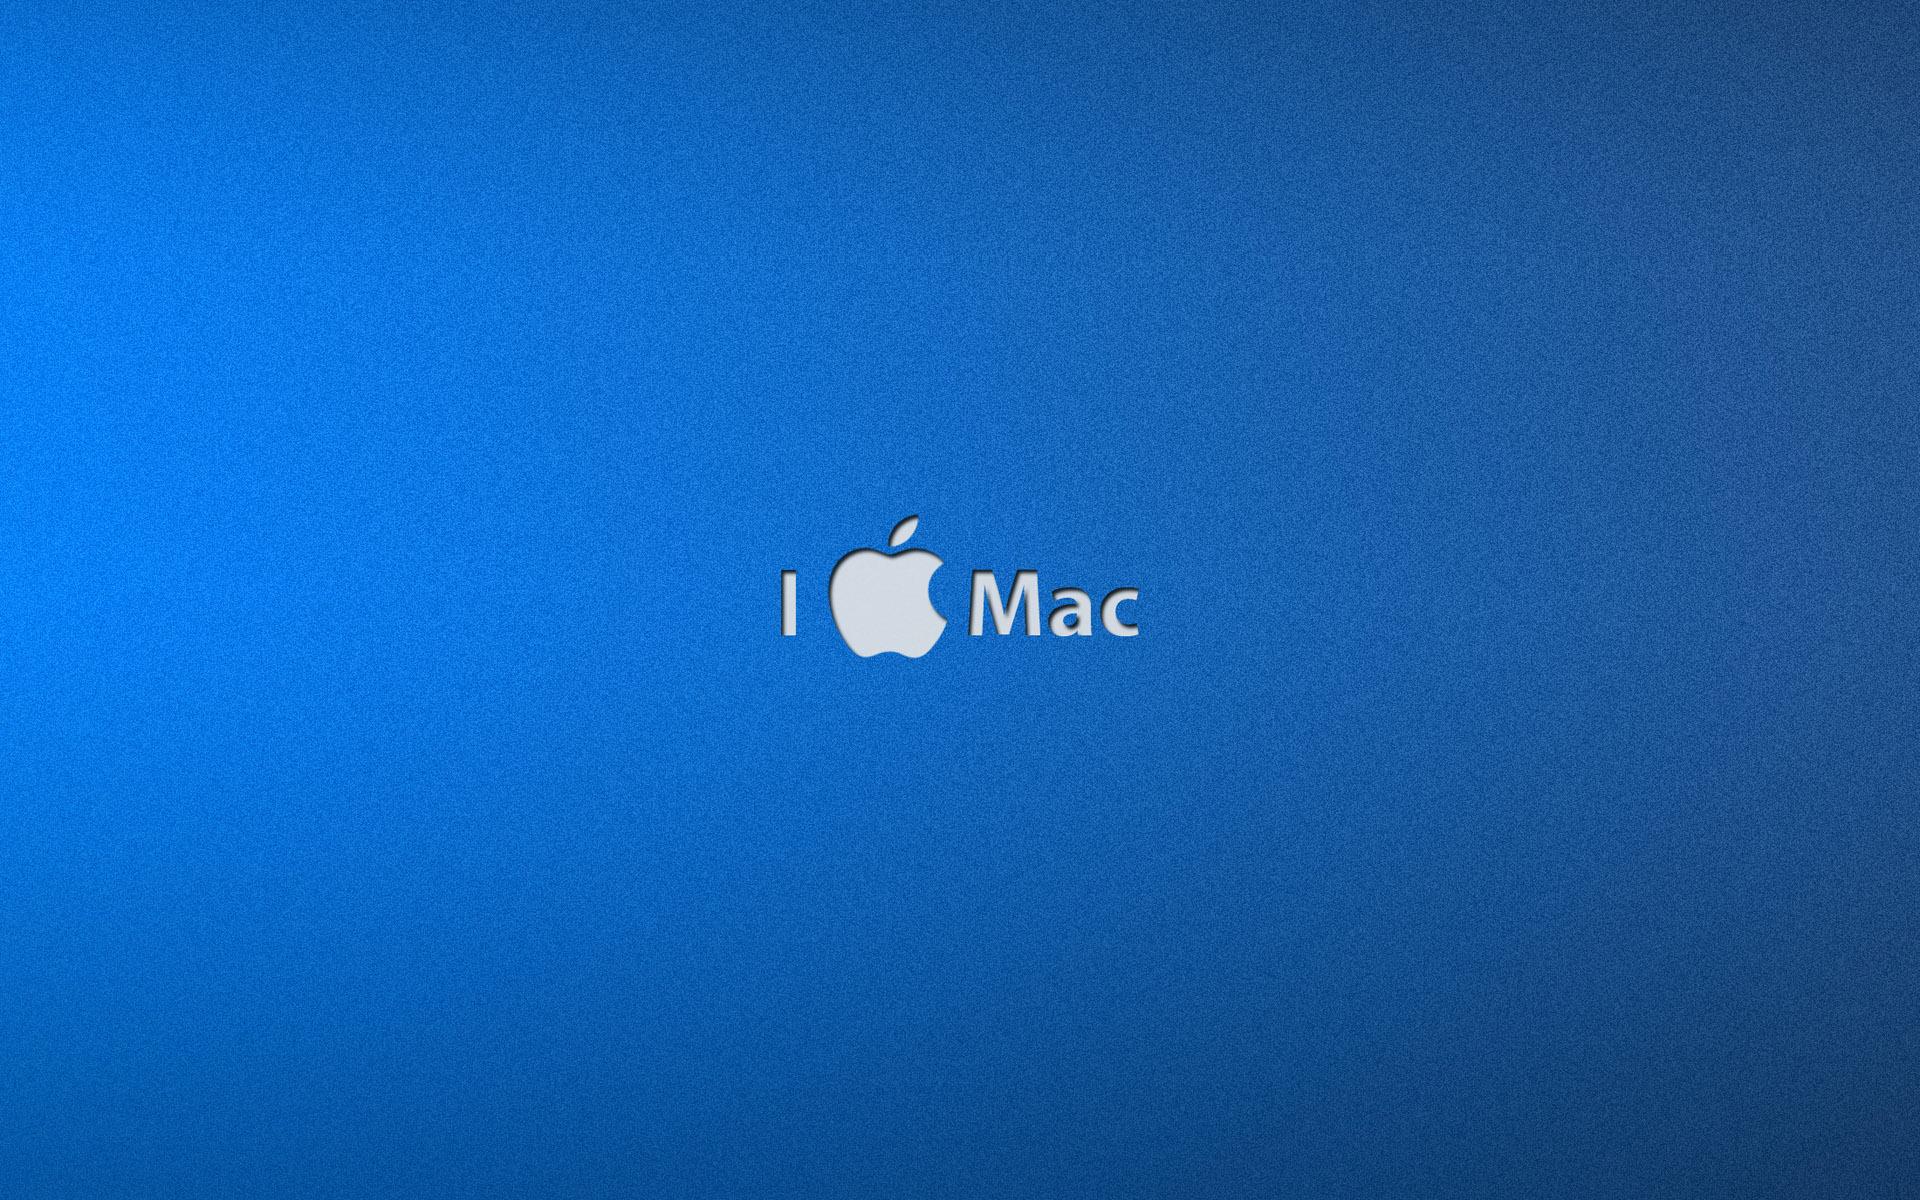 Apple主题电脑桌面壁纸